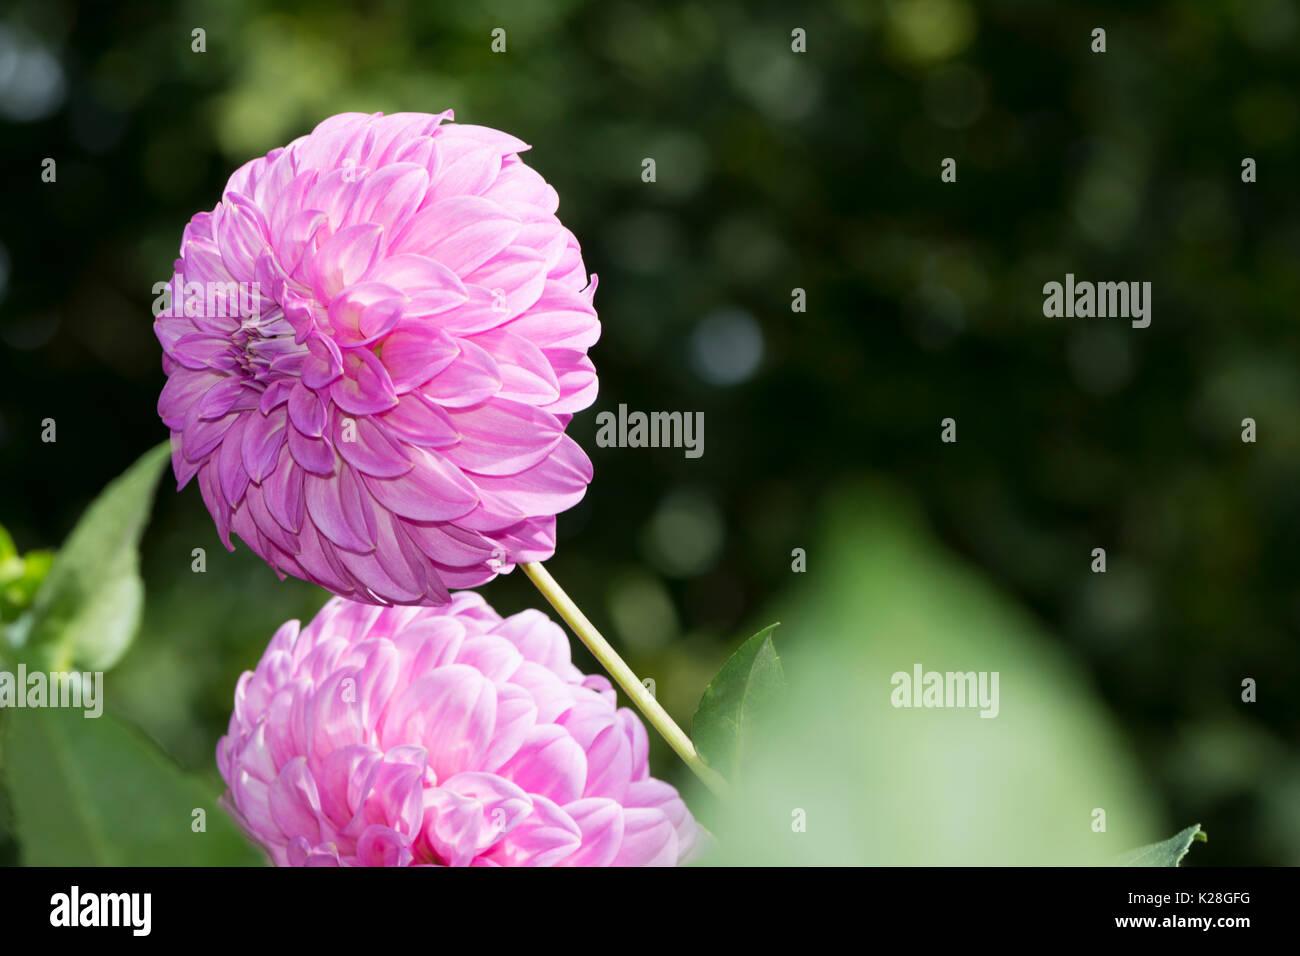 Two Light Pink Bracken Sequel Dahlia Flowers Growing In A Natural